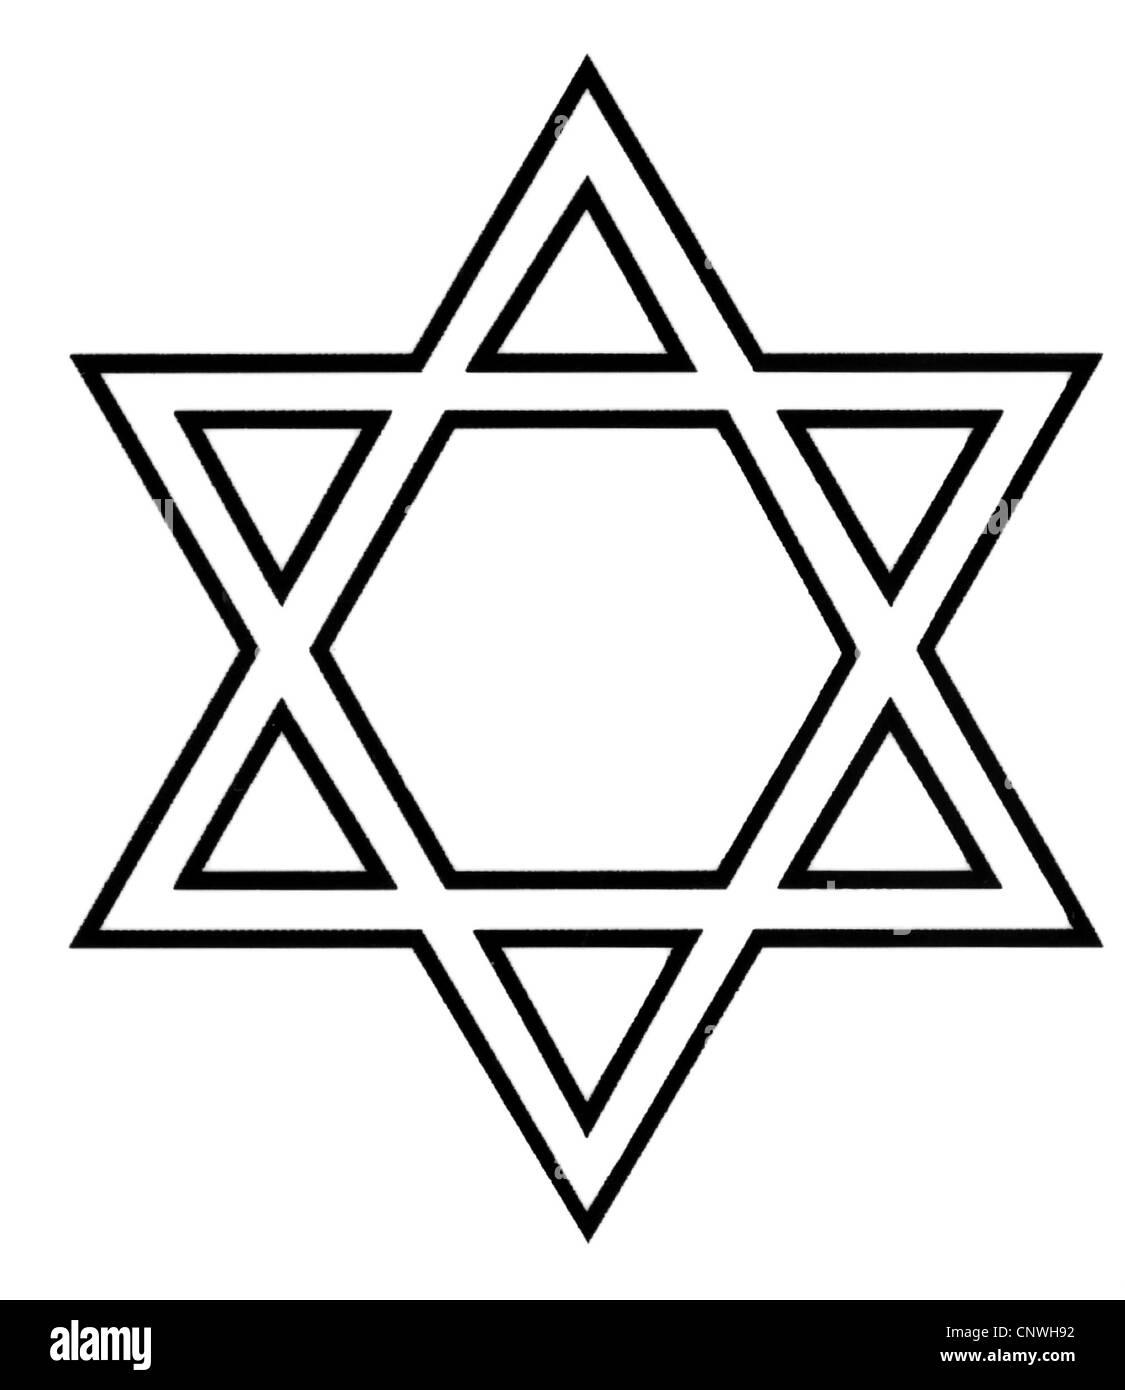 Symbole, David Stern, Computergrafik, Additional-Rights - Clearences-NA Stockbild